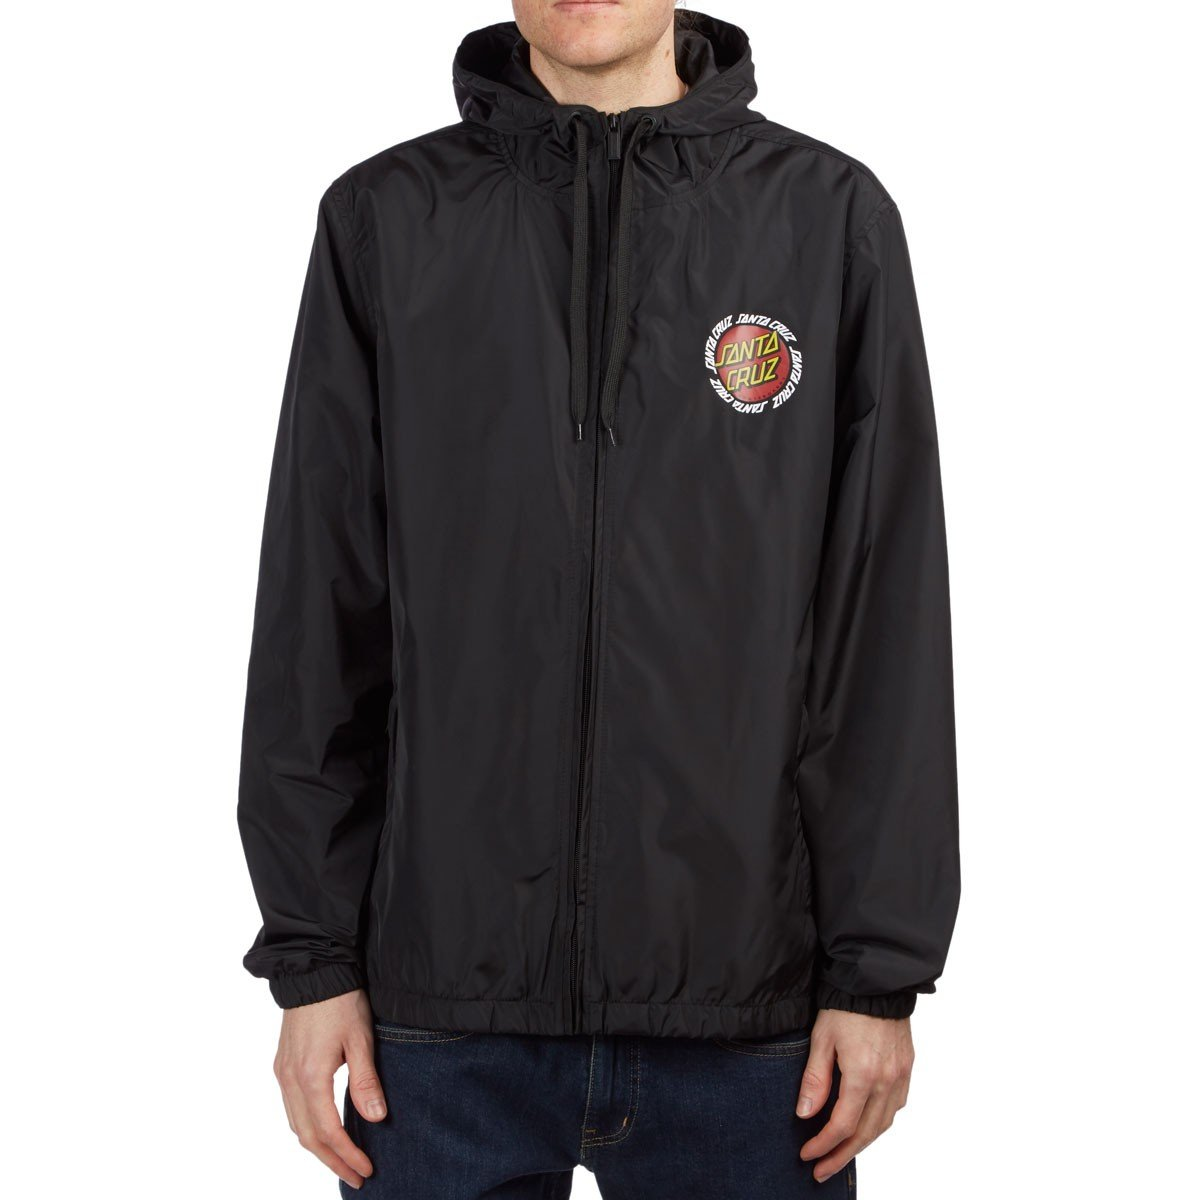 4724e9c45d Santa Cruz Men's Ringed Dot Hooded Windbreaker Jackets at Amazon Men's  Clothing store: